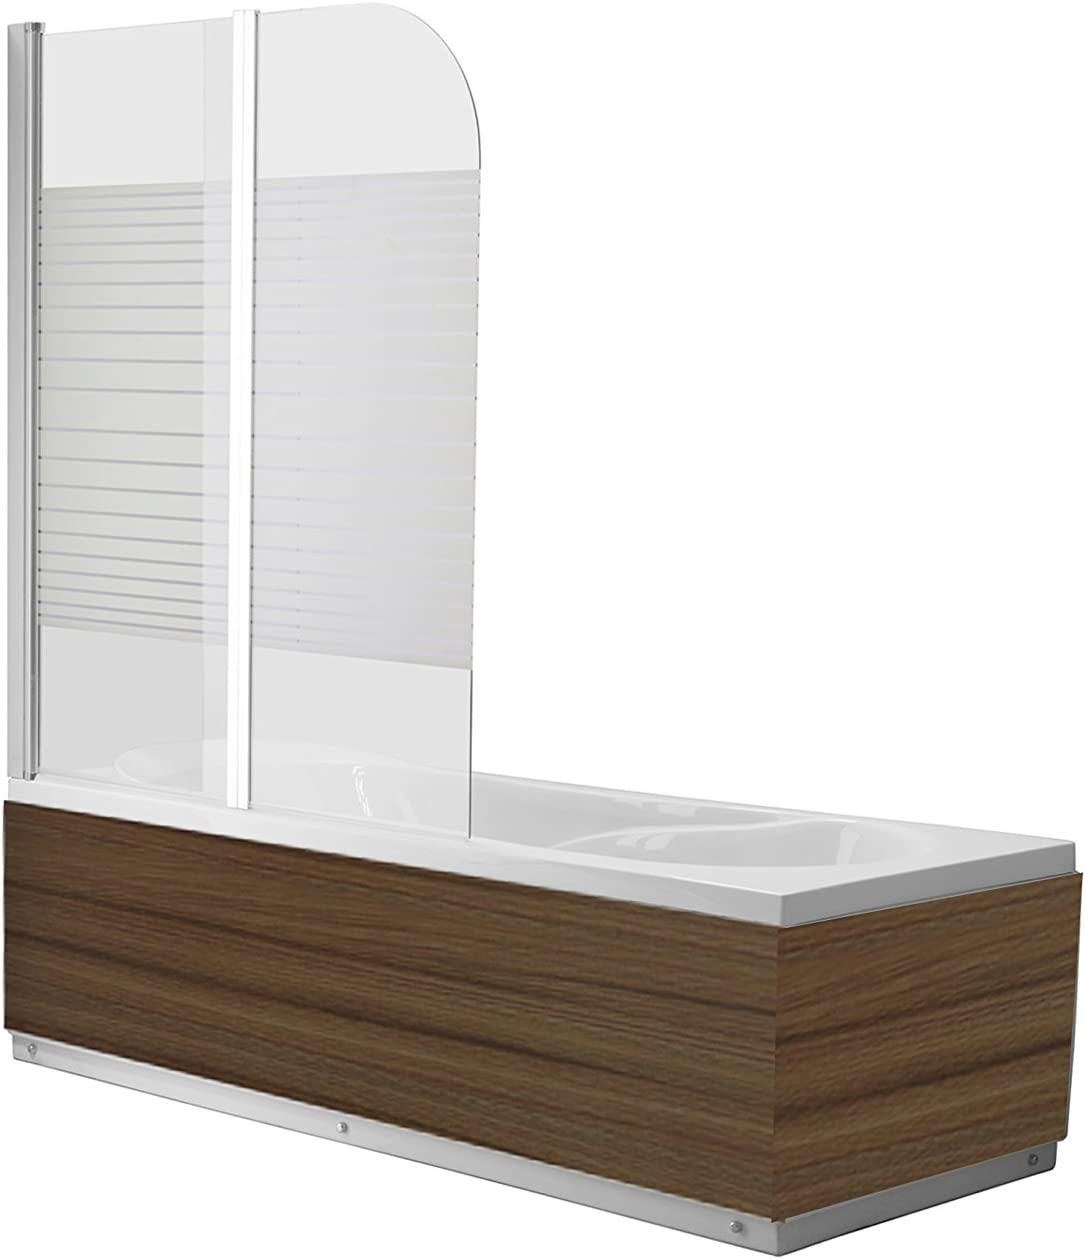 Vidrio Mampara Dallas Cristal satén Striped bañera plegable pared ...